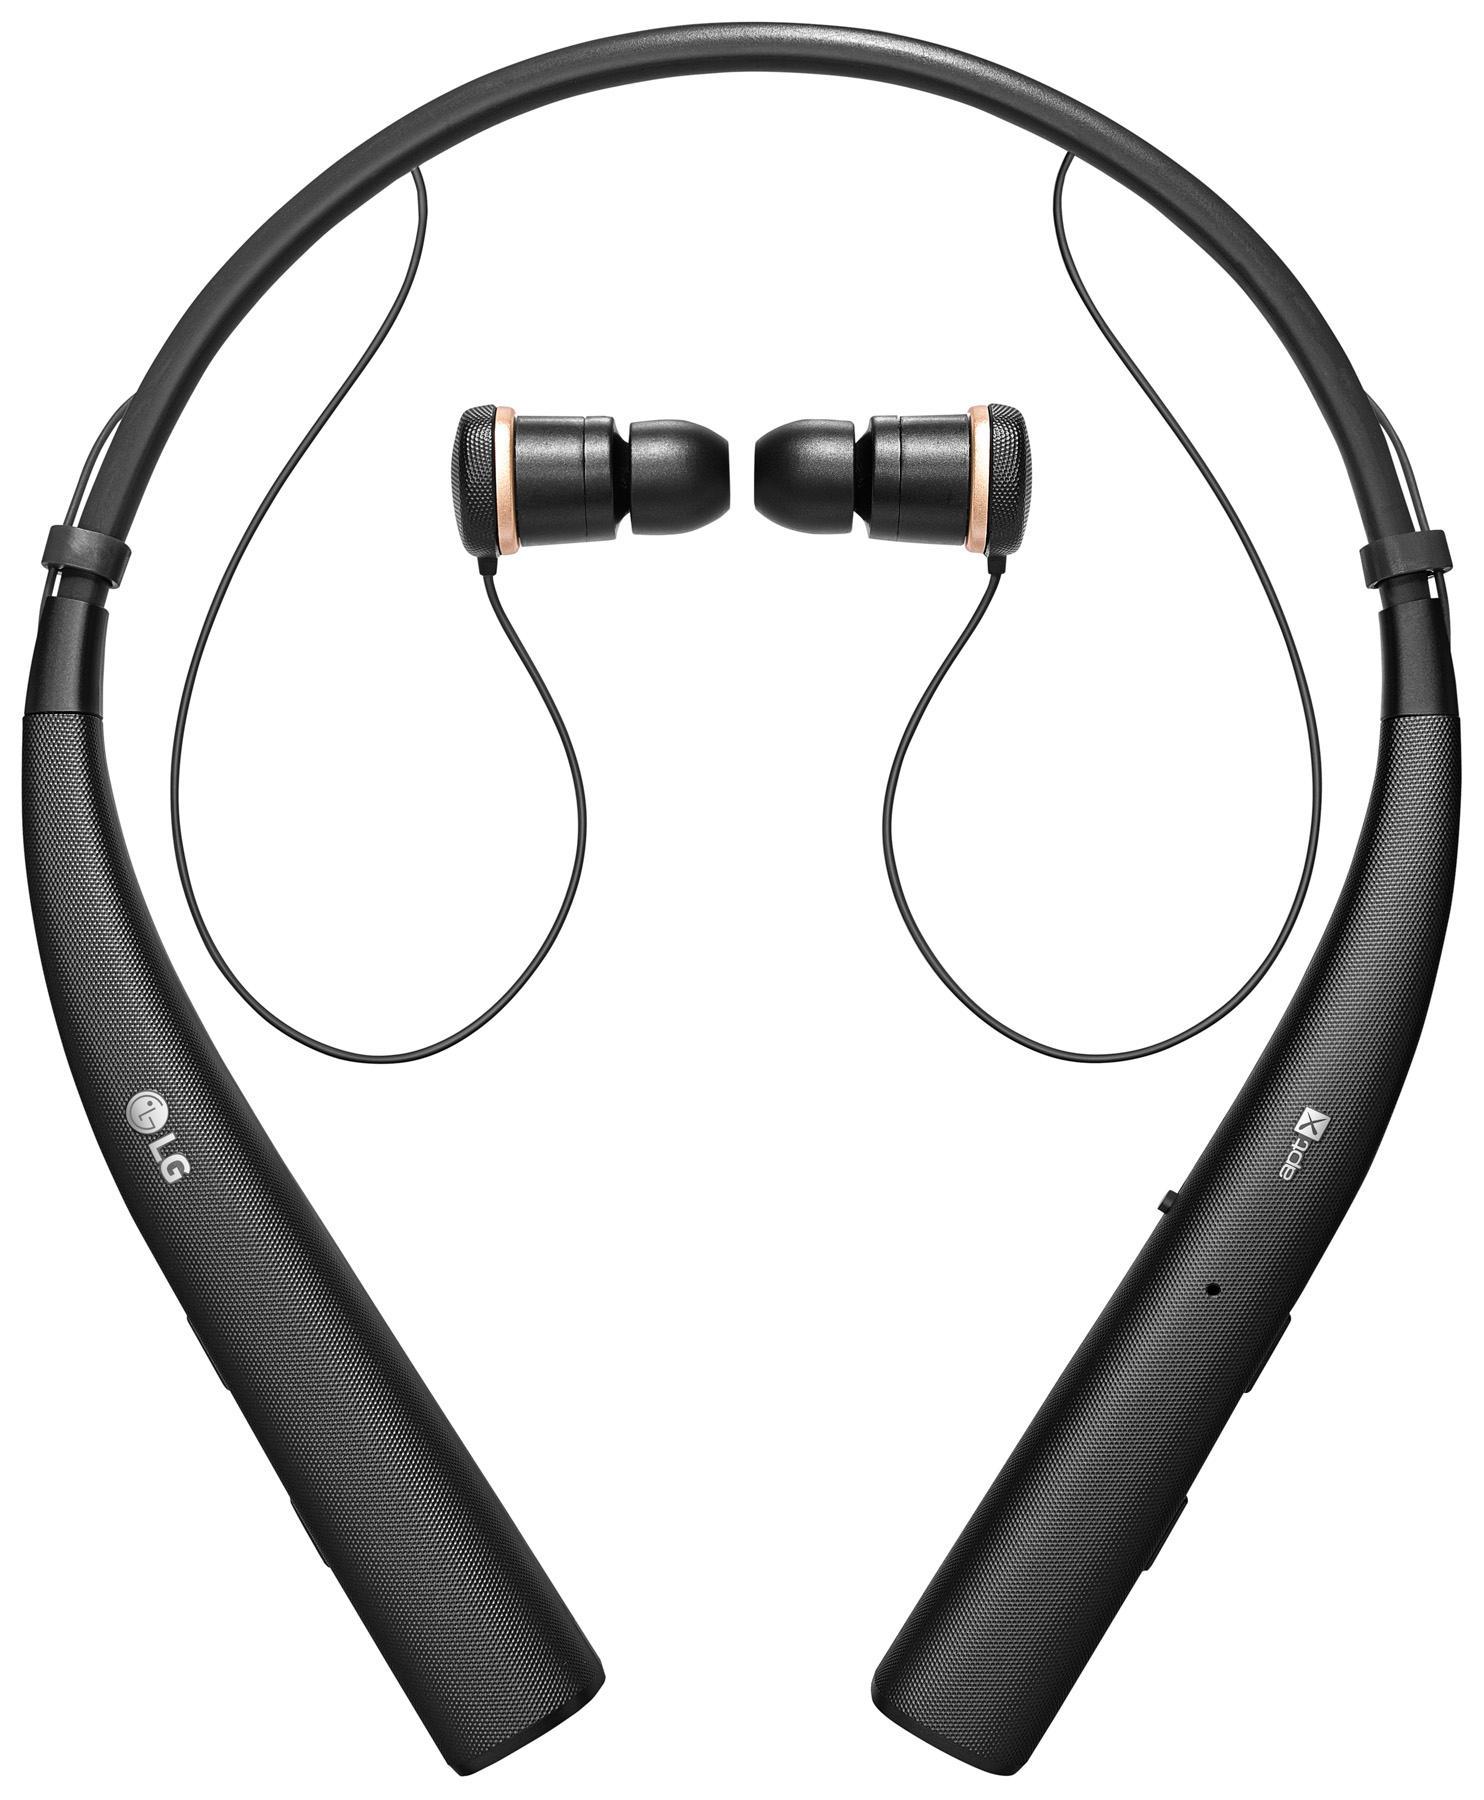 LG Tone Pro HBS 780 Bluetooth Wireless Stereo Headset